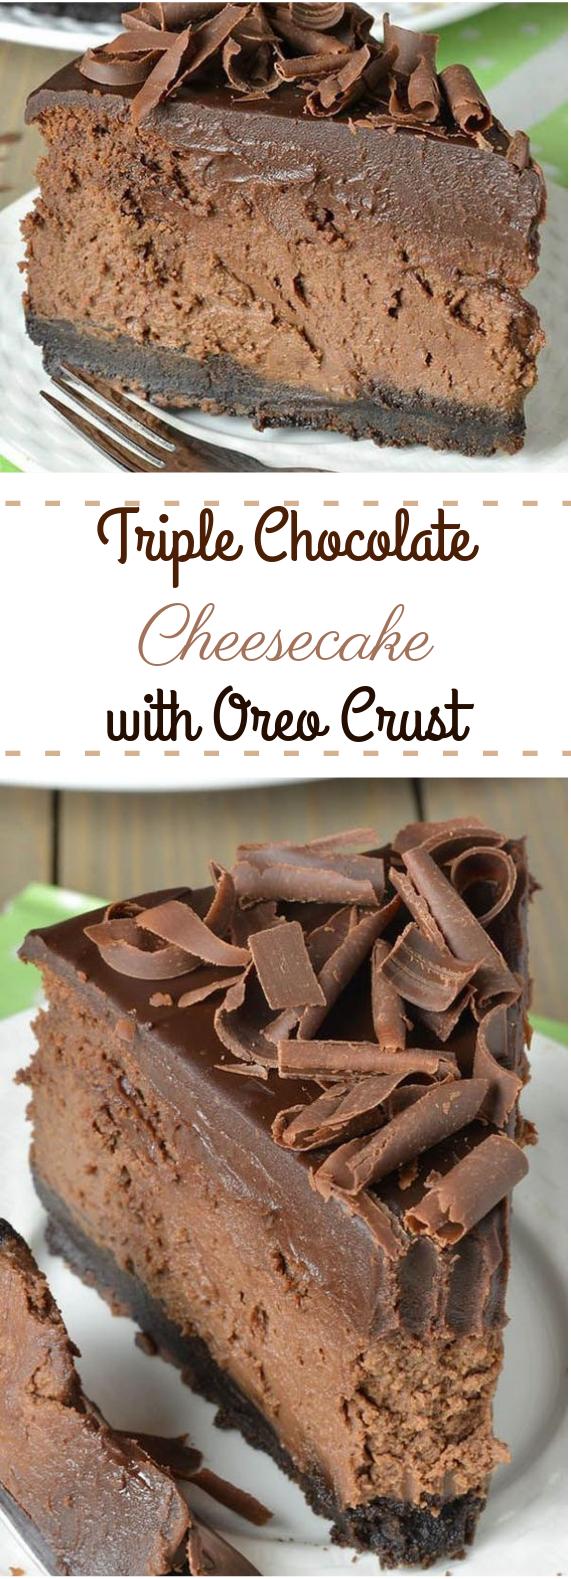 Triple Chocolate Cheesecake with Oreo Crust #chocolate #cake